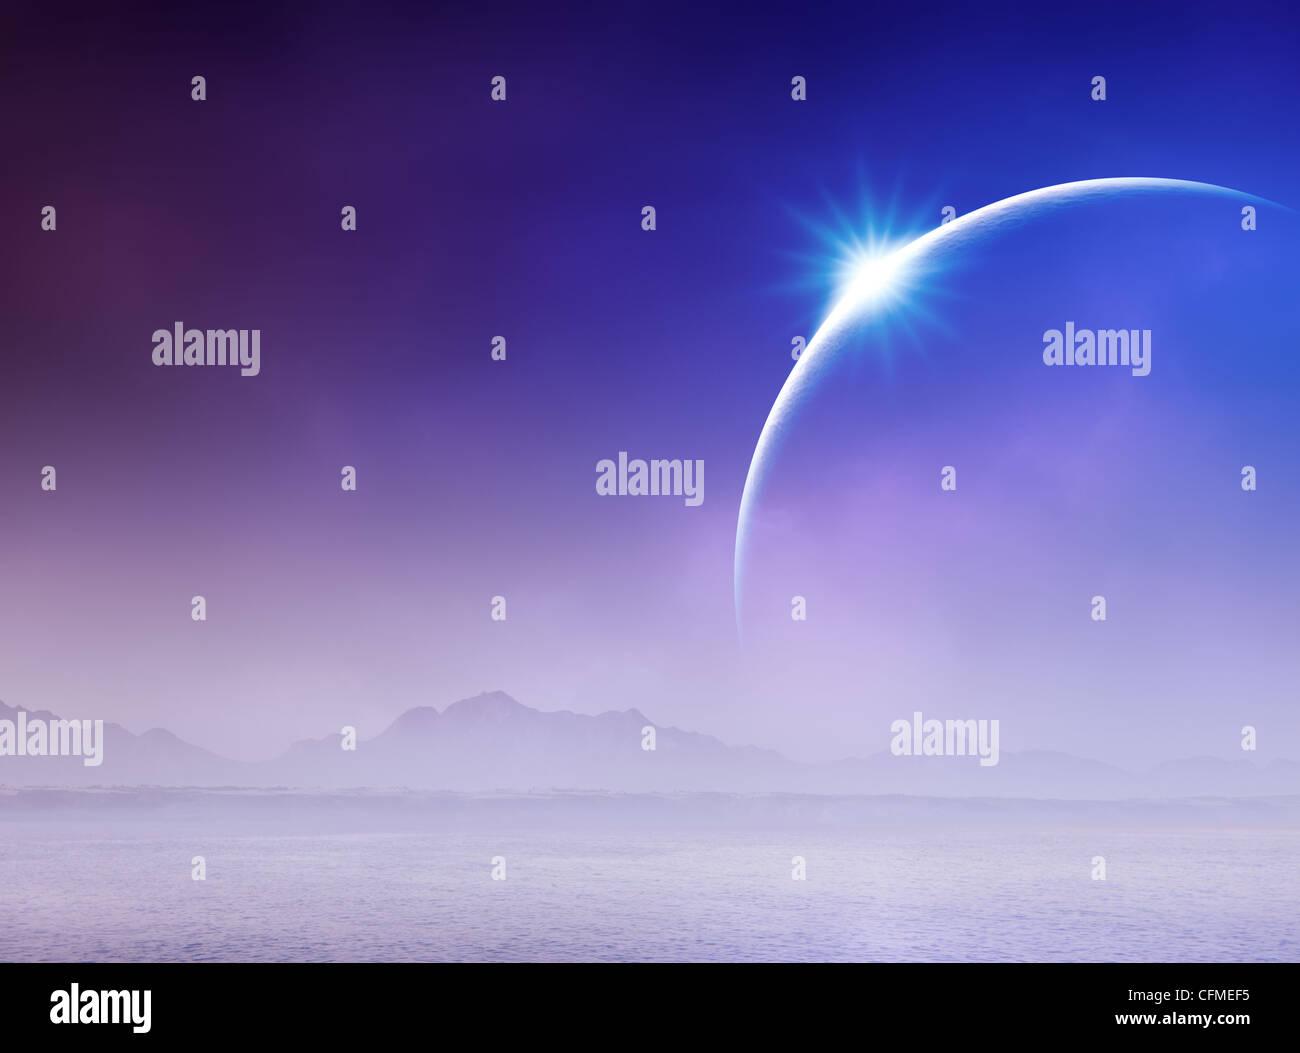 Surreal Solar Eclipse over misty seascape (Digital art) - Stock Image